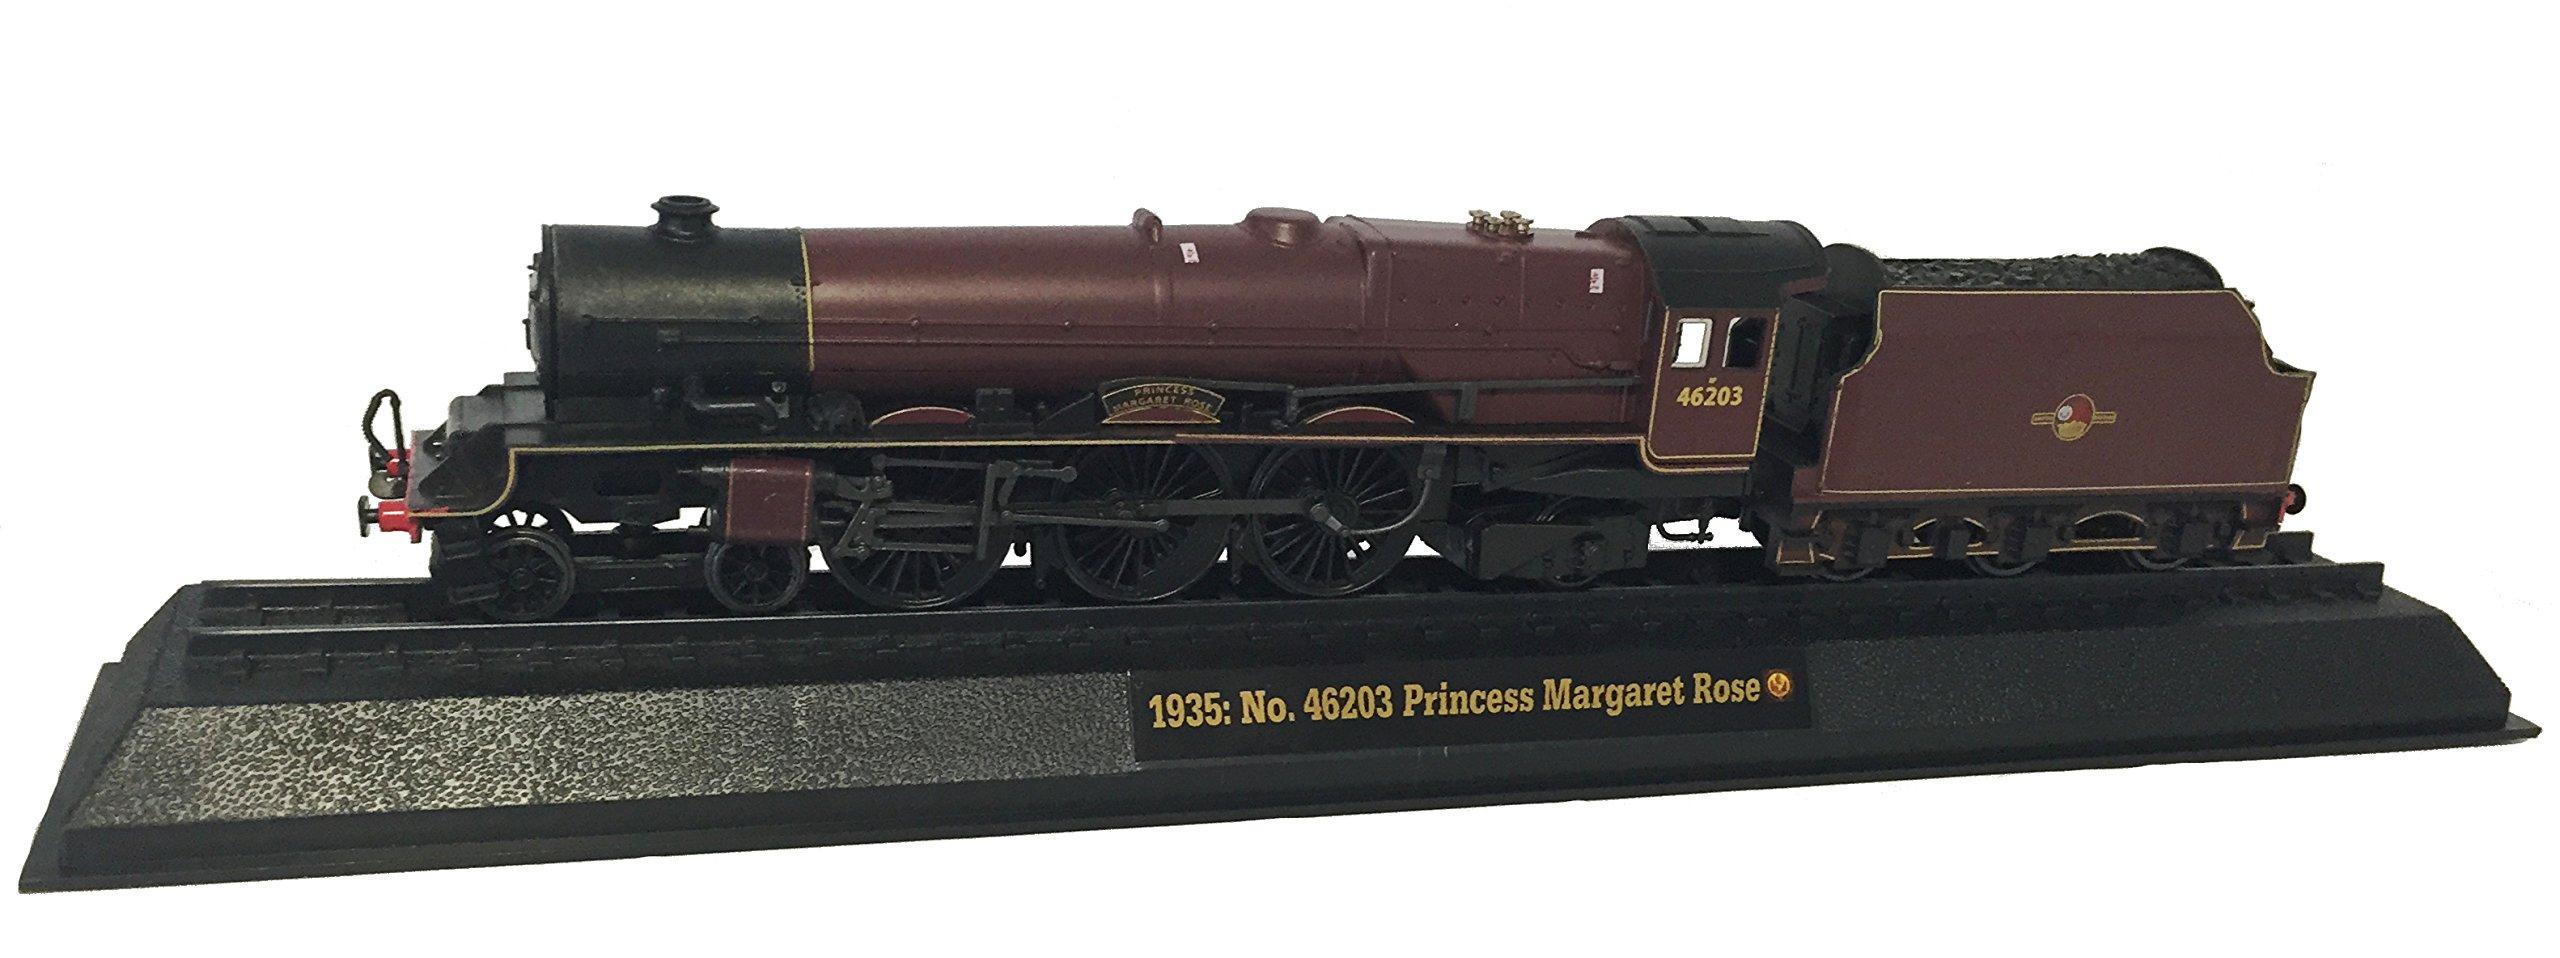 No. 46203 Princess Margaret Rose - 1935 Diecast 1:76 Scale Locomotive Model (Amercom OO-19)